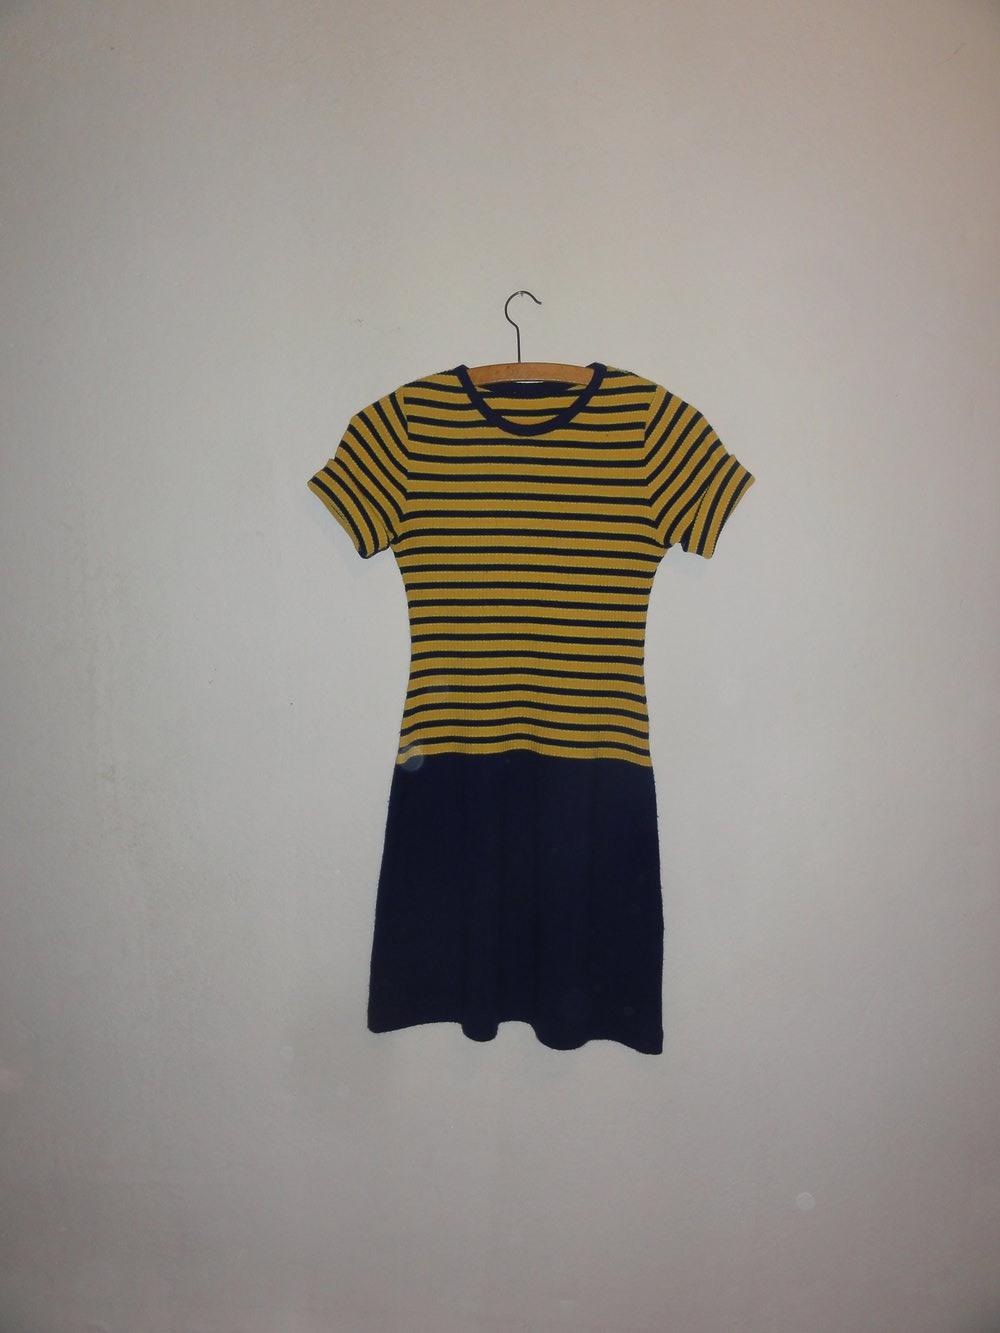 Formal Einfach Kleid Gelb Blau Vertrieb20 Einfach Kleid Gelb Blau Vertrieb